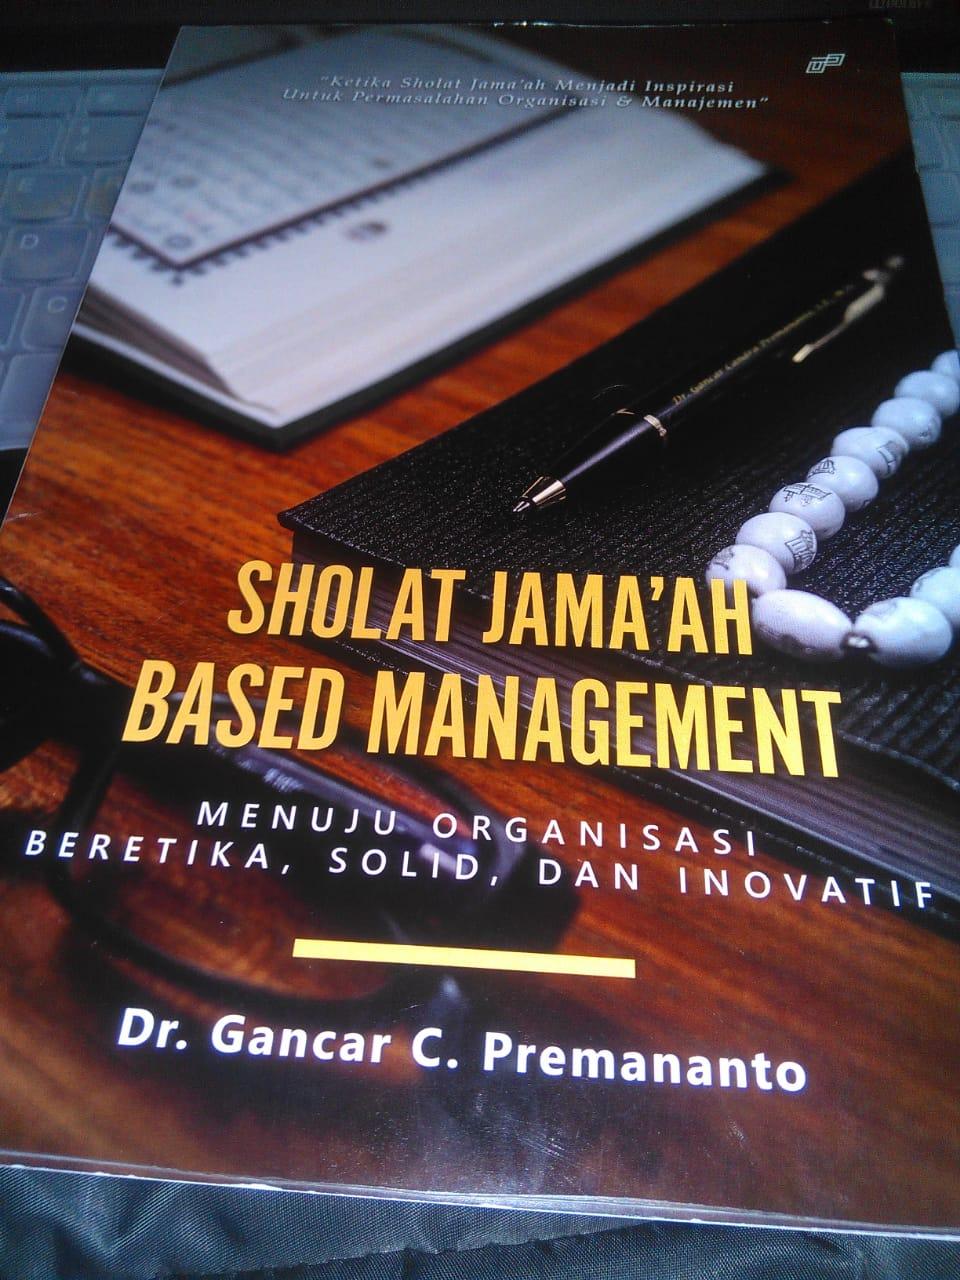 Sholat Jamaah based Management by GCP MM FEB Unair 8 Okt 2018 g